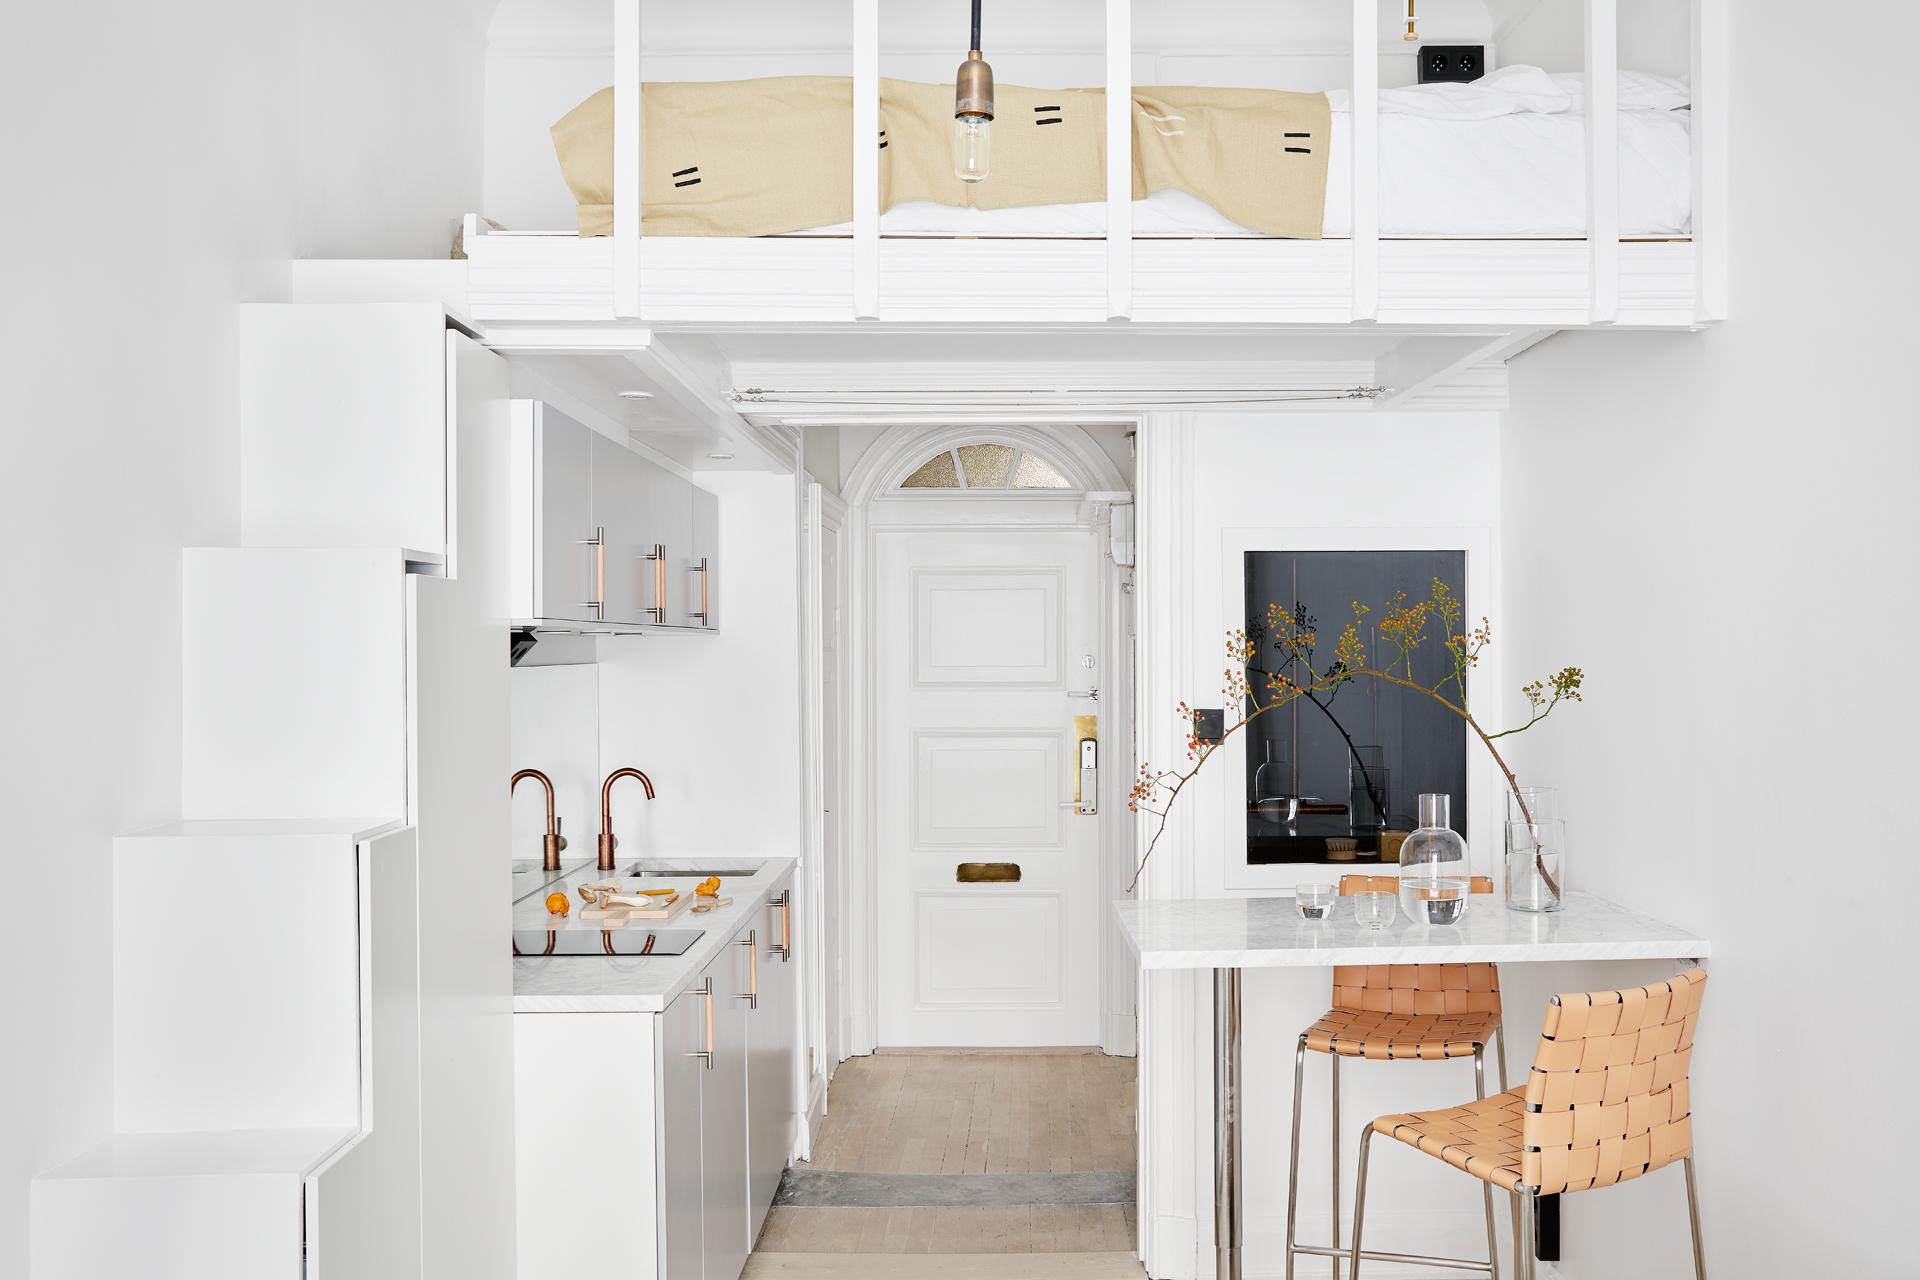 Dit kleine appartement van 18m2 is leuk inrichting - Kleine studio ontwikkeling ...